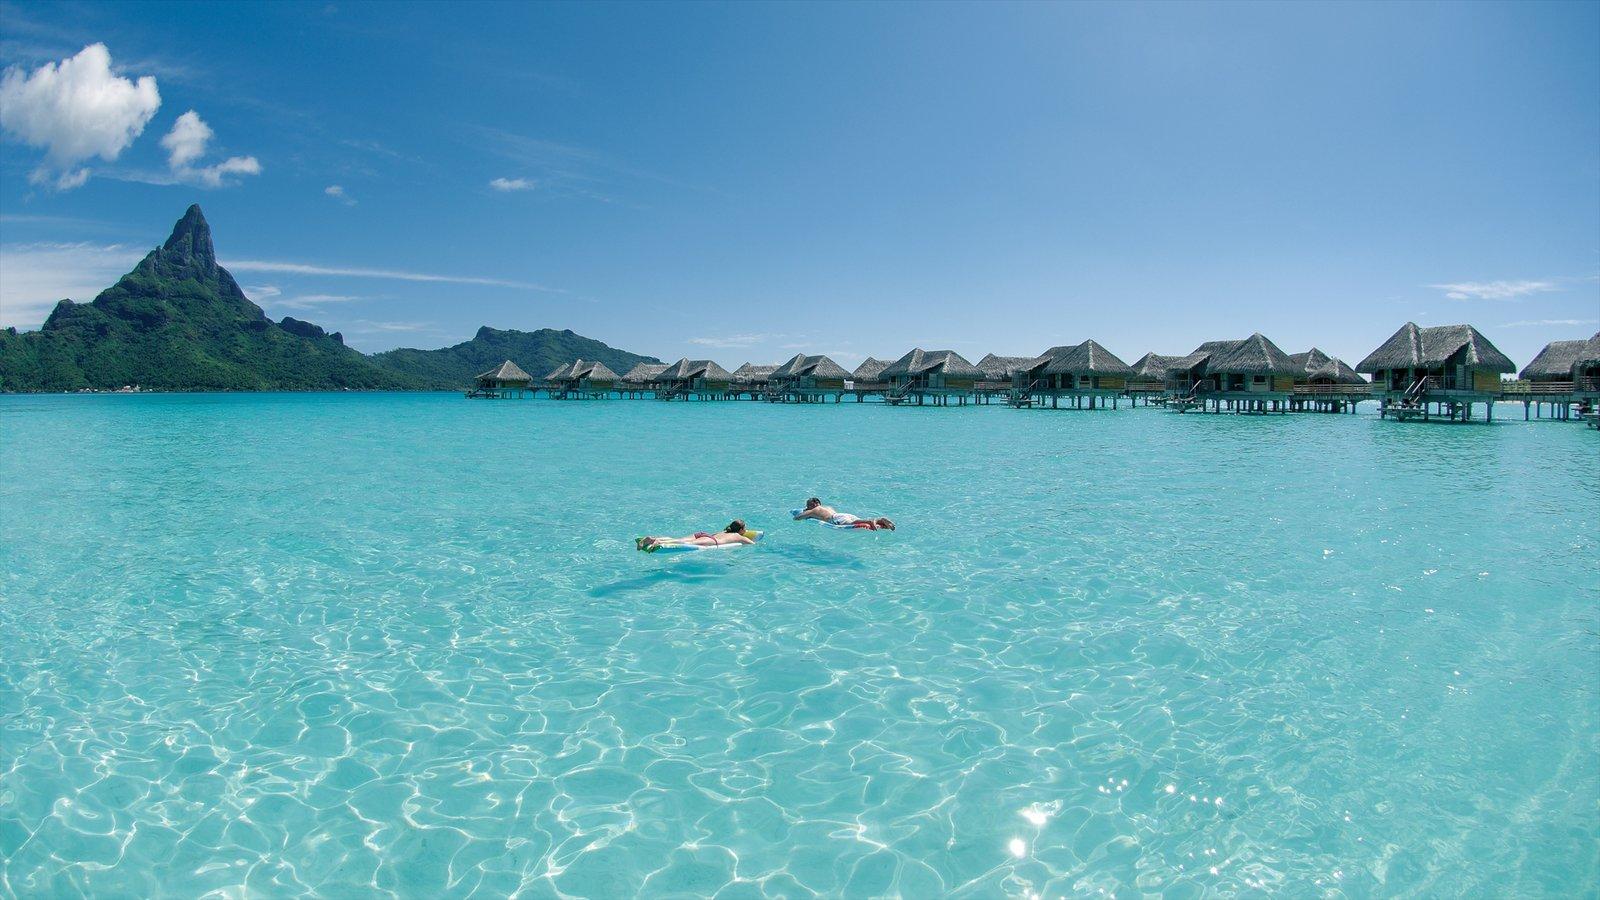 Bora Bora showing tropical scenes, general coastal views and landscape views